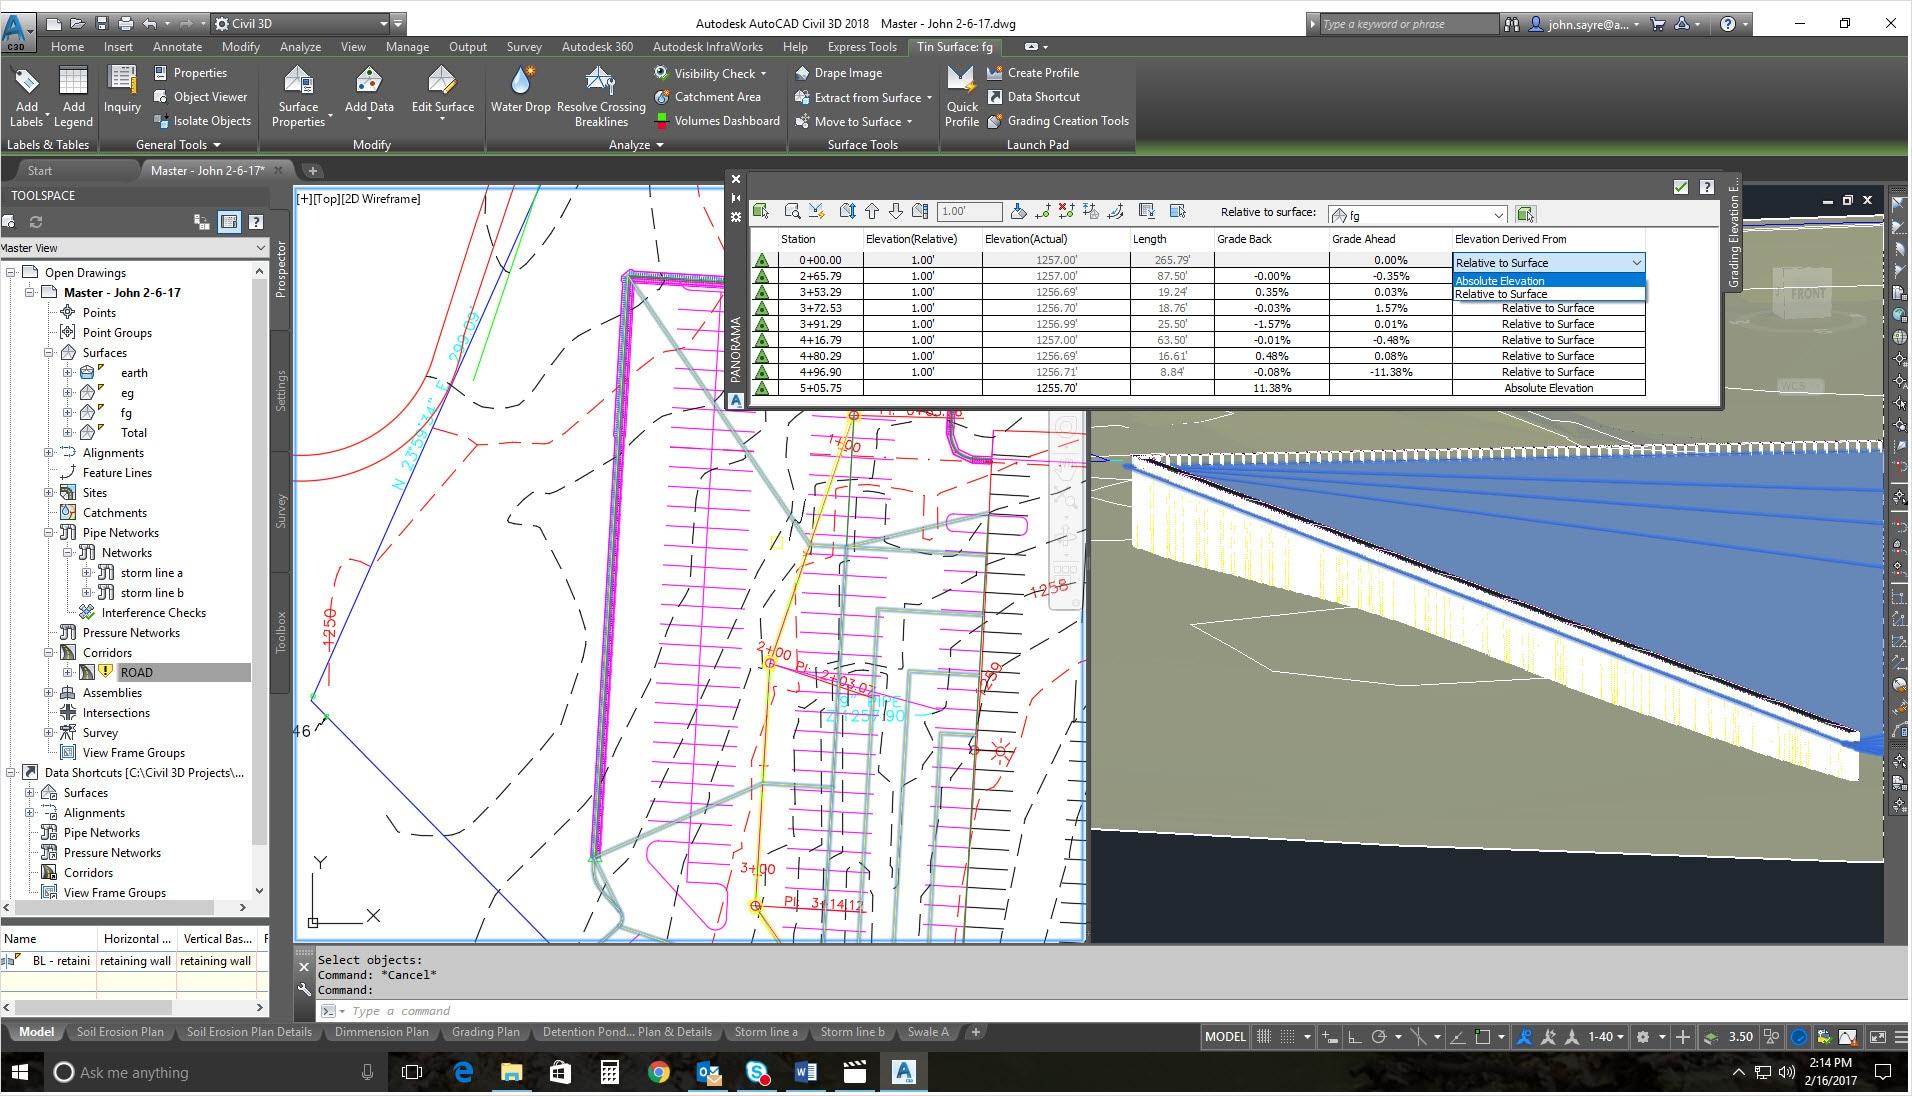 Civil D Draw Line Bearing Distance : Neu in autocad civil d funktionen autodesk